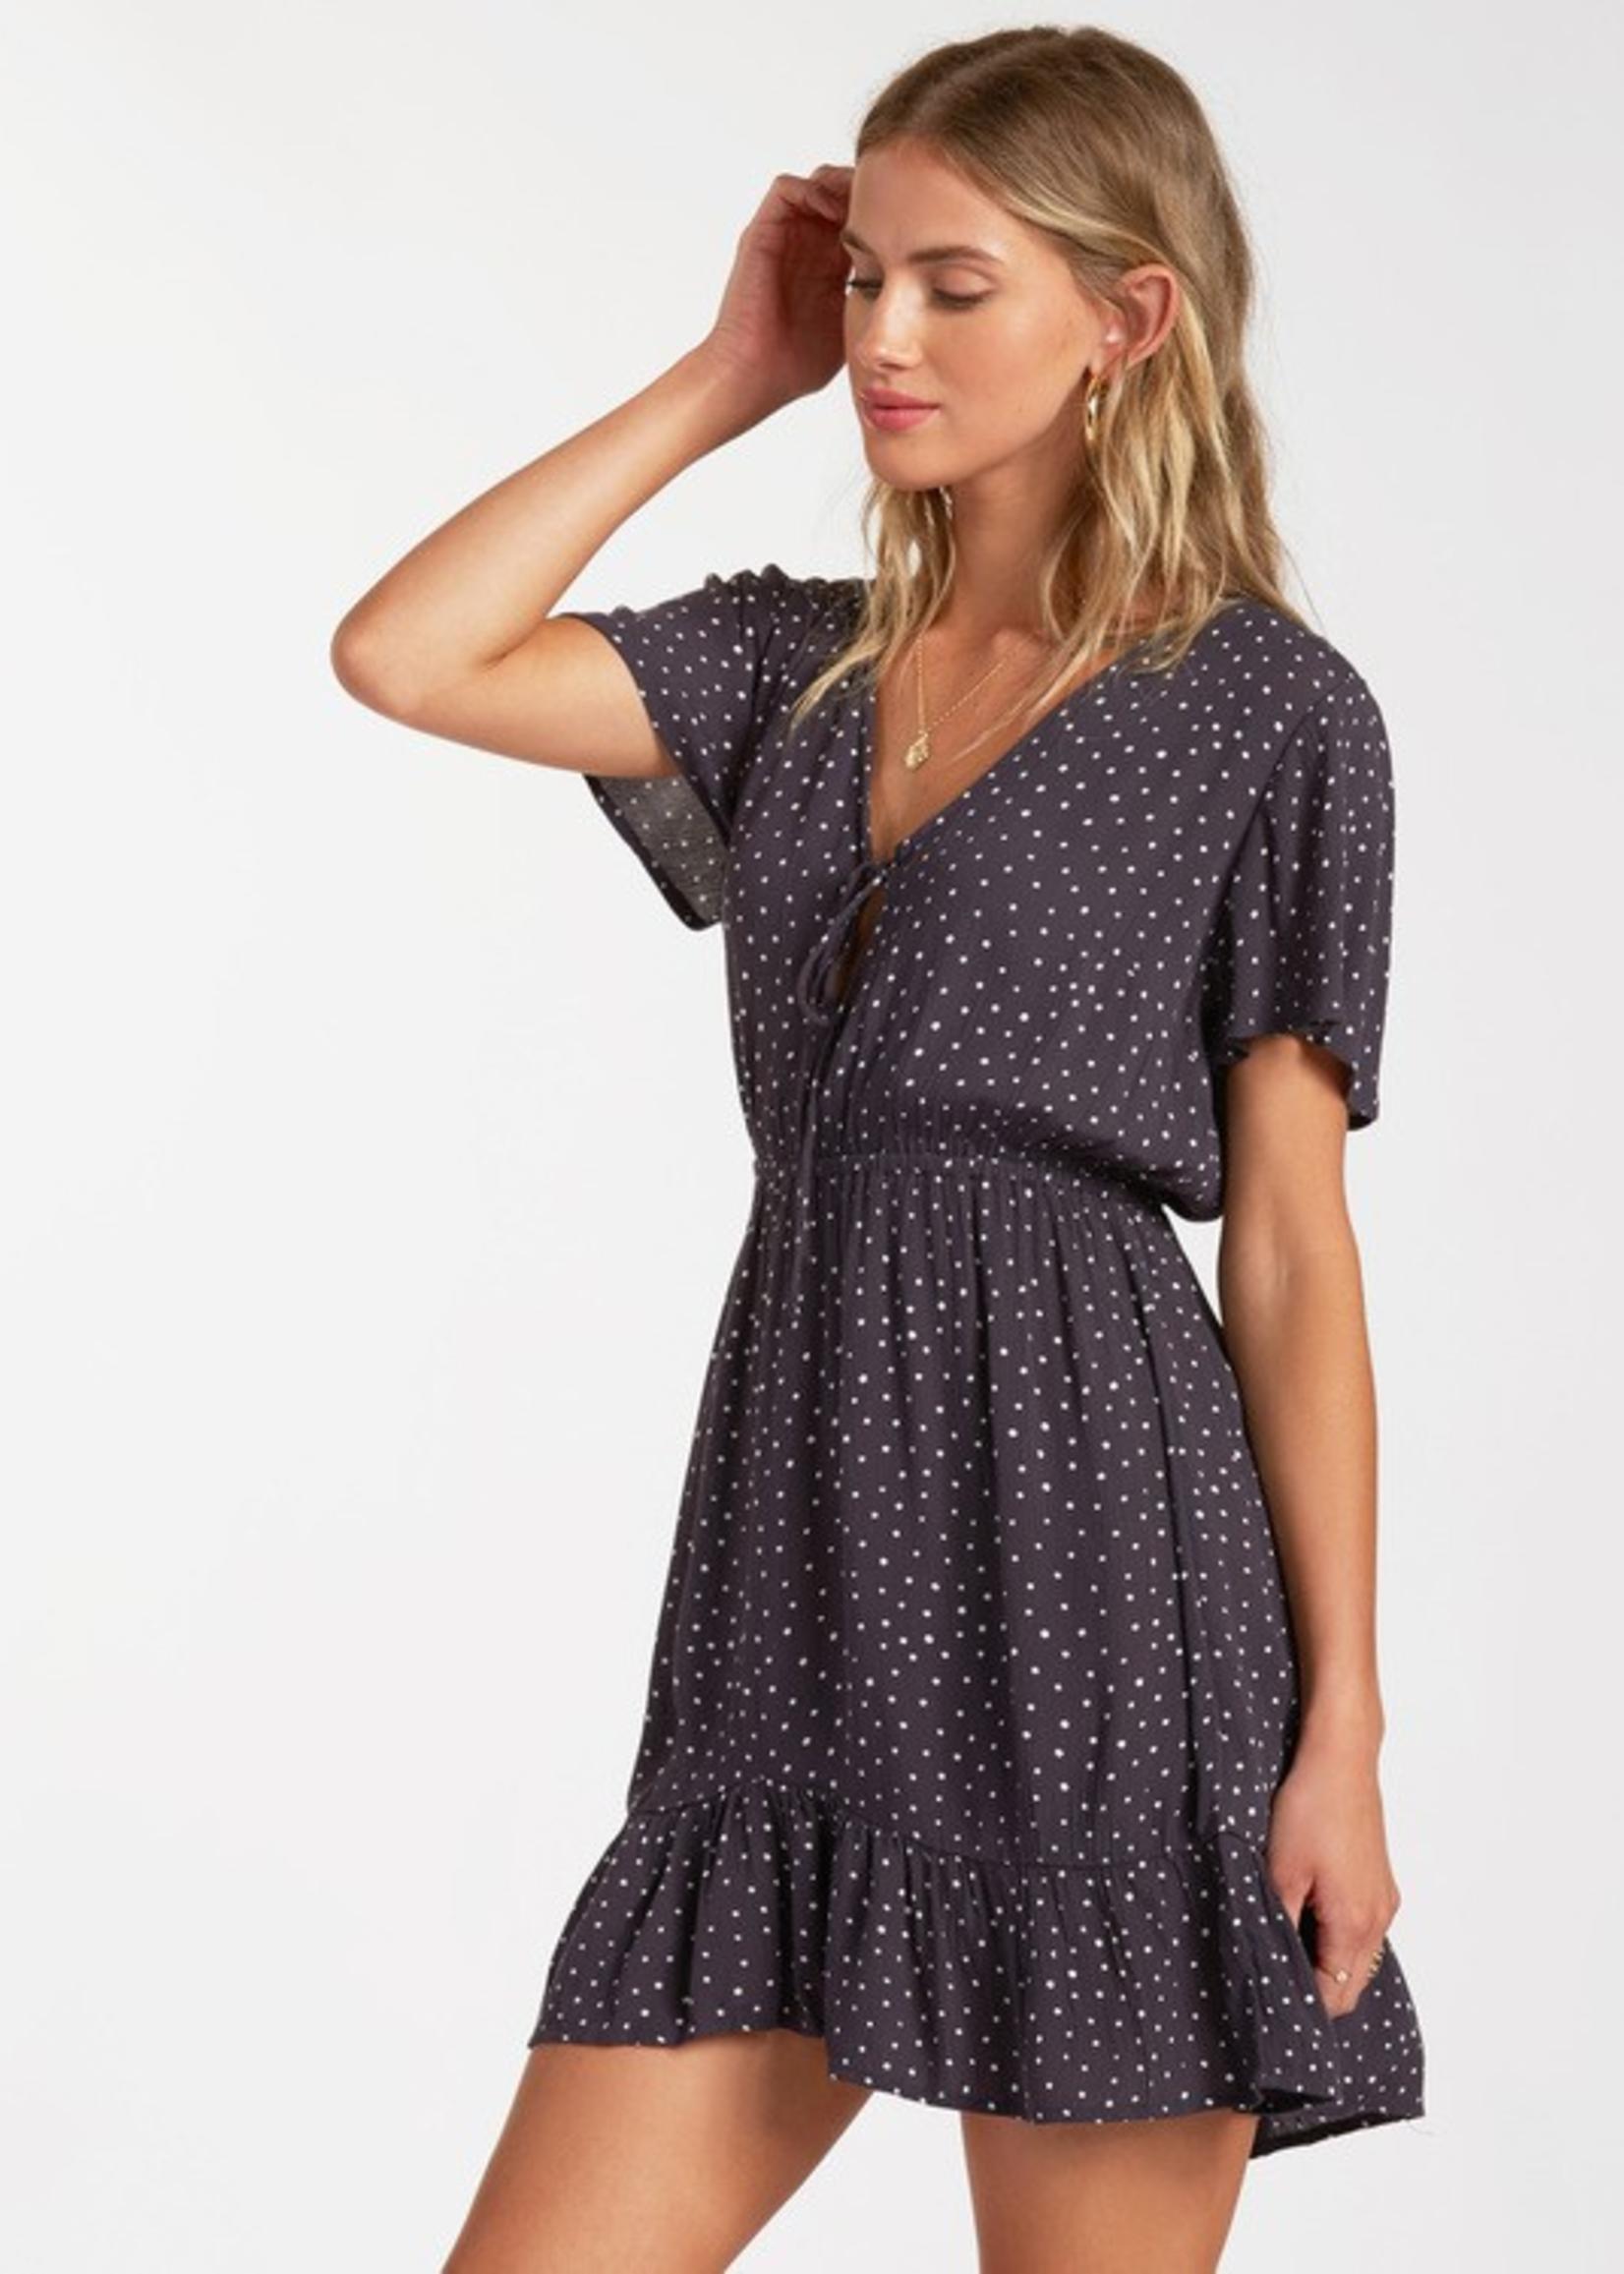 Billabong Day Trippin Dress - Black